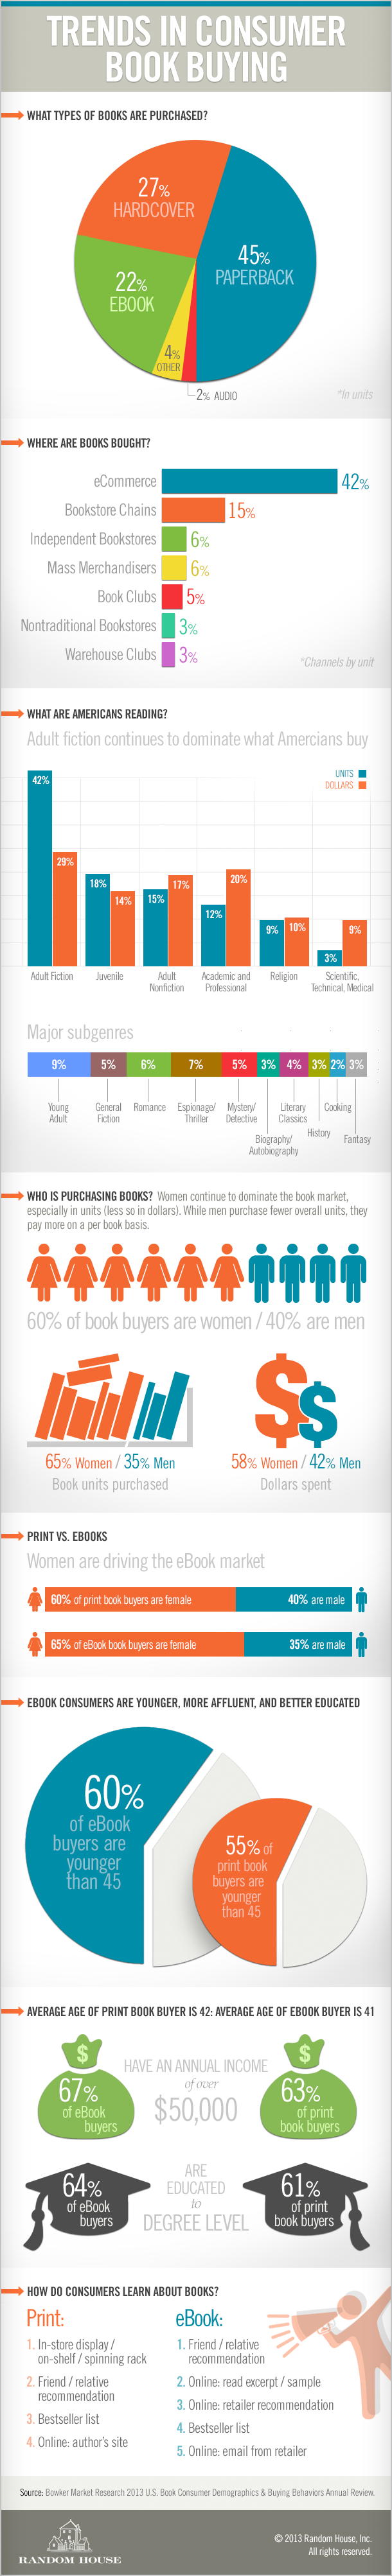 Book-Sales-Statistics